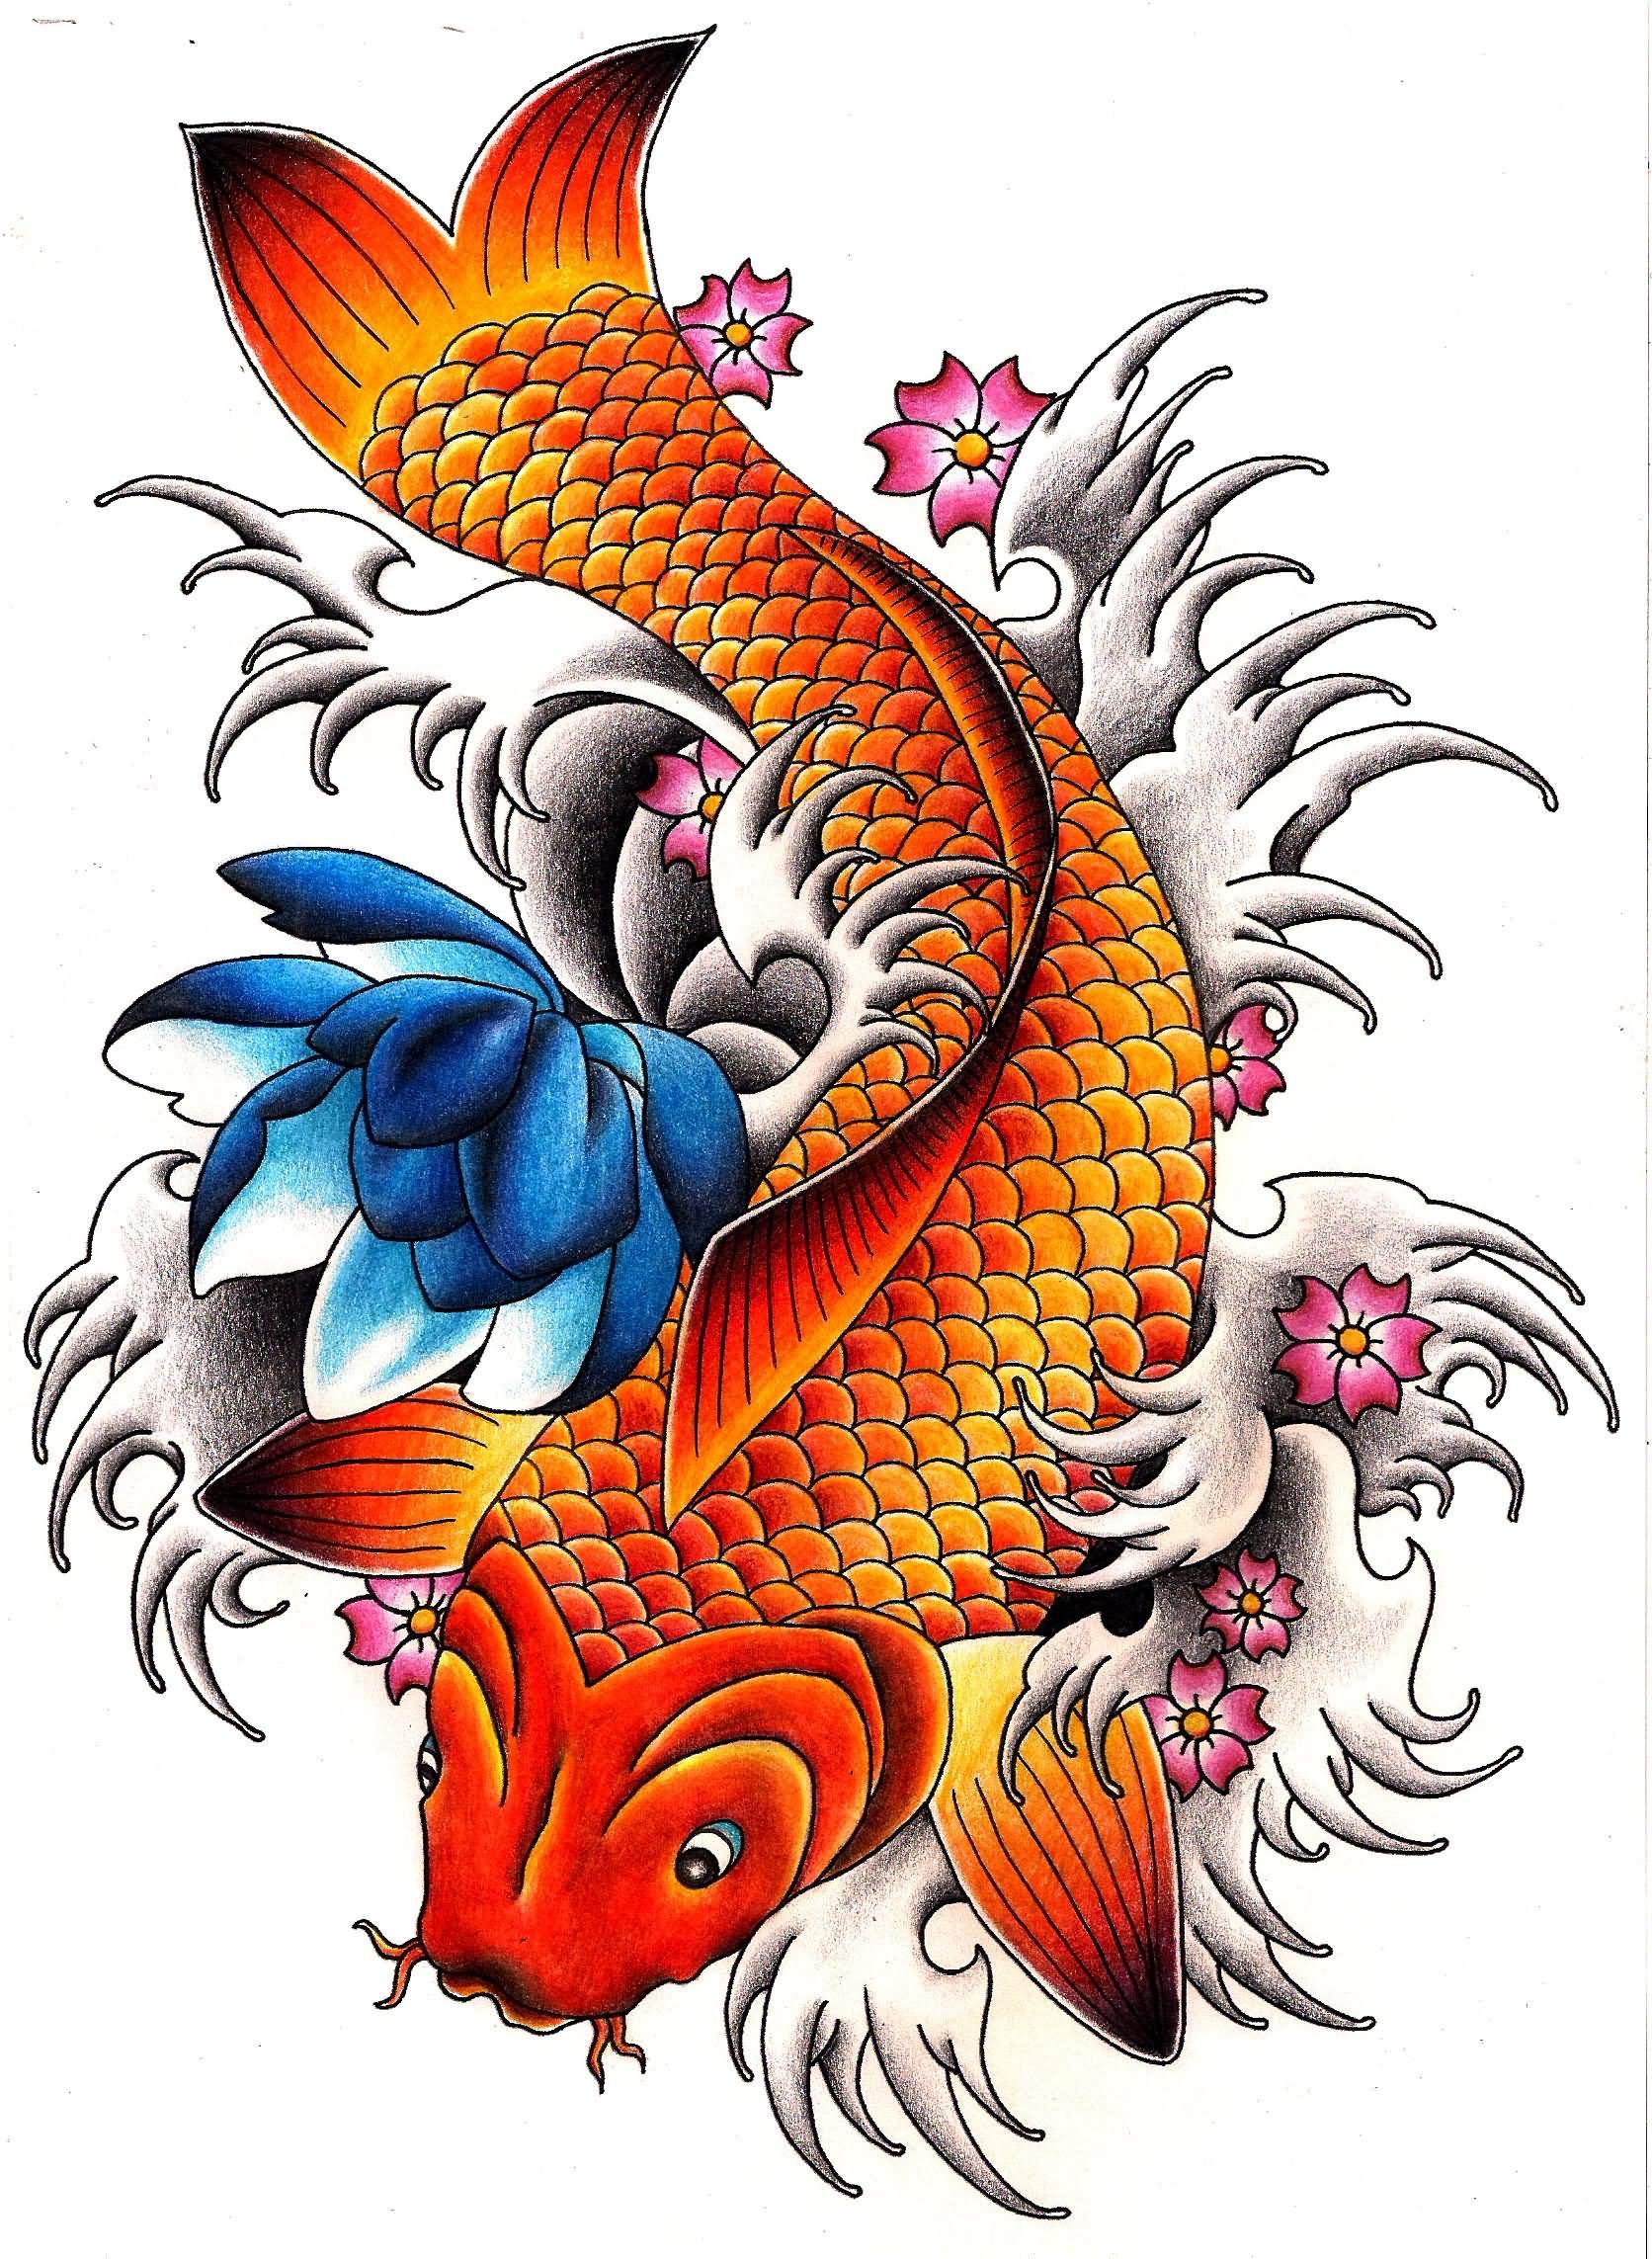 Amazing Carp Fish With Flowers Tattoo Design | Carp orname ...